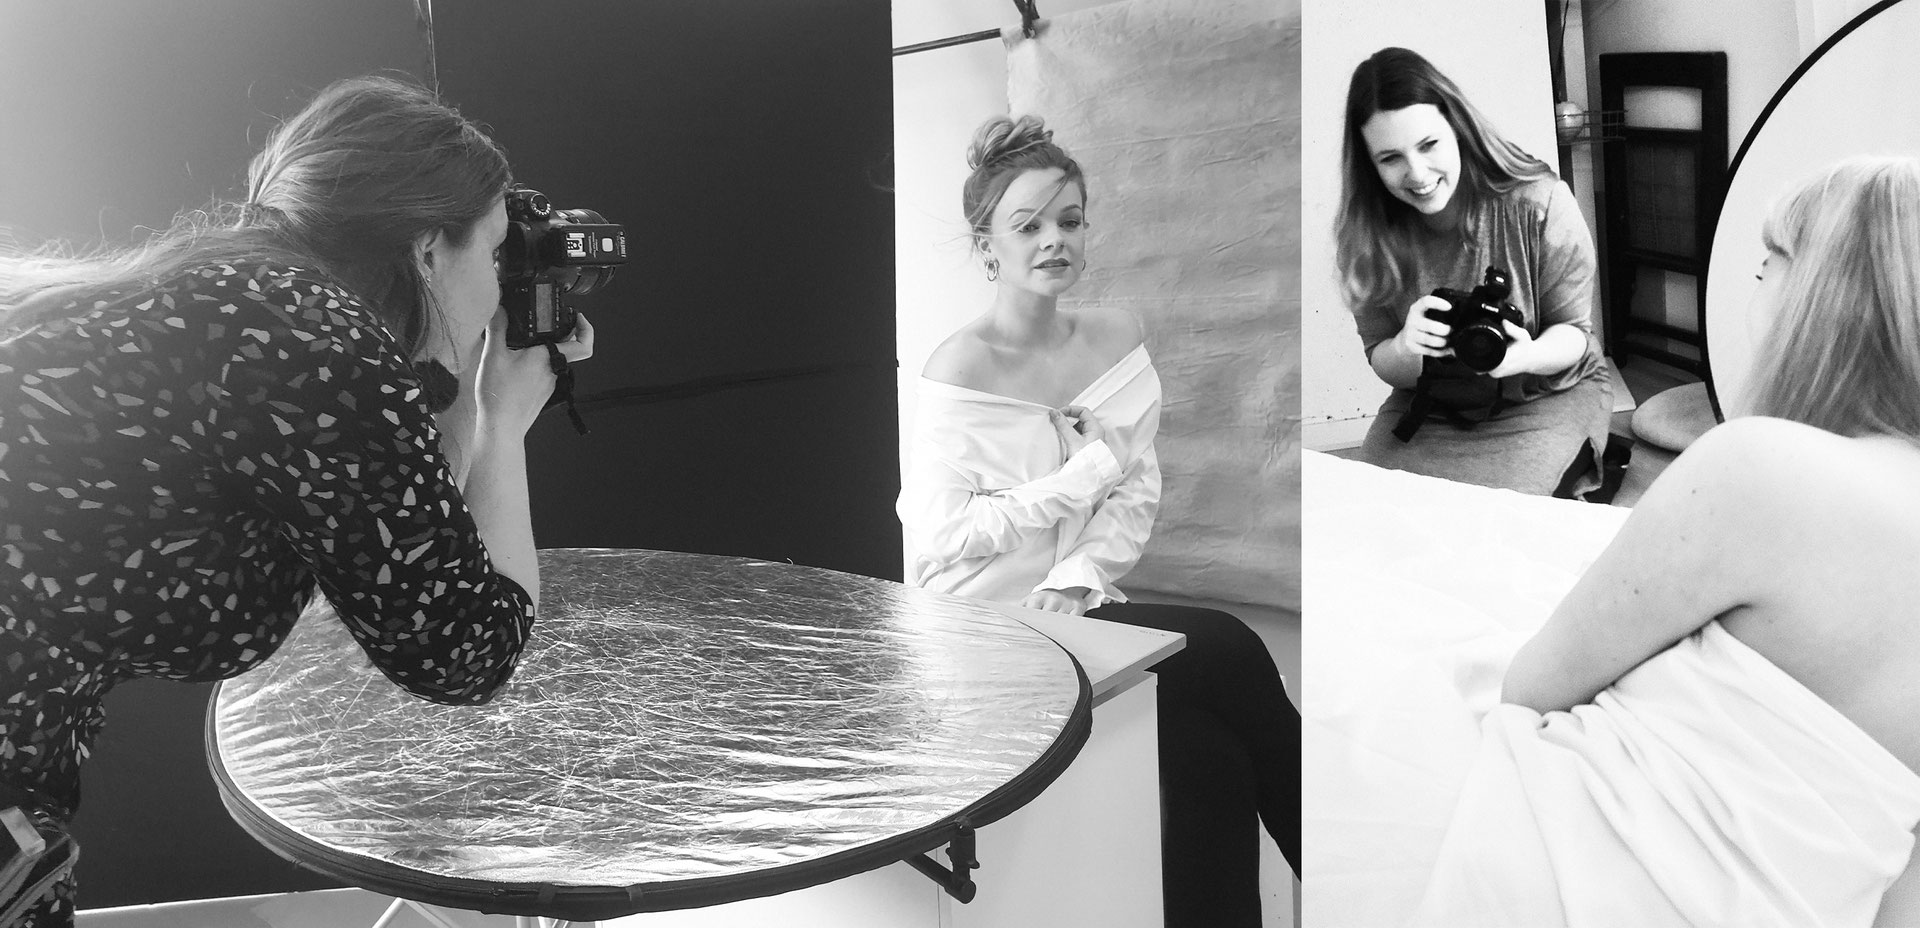 behind-the-scenes-portrait-phorography-photoshoot-studio-eindhoven